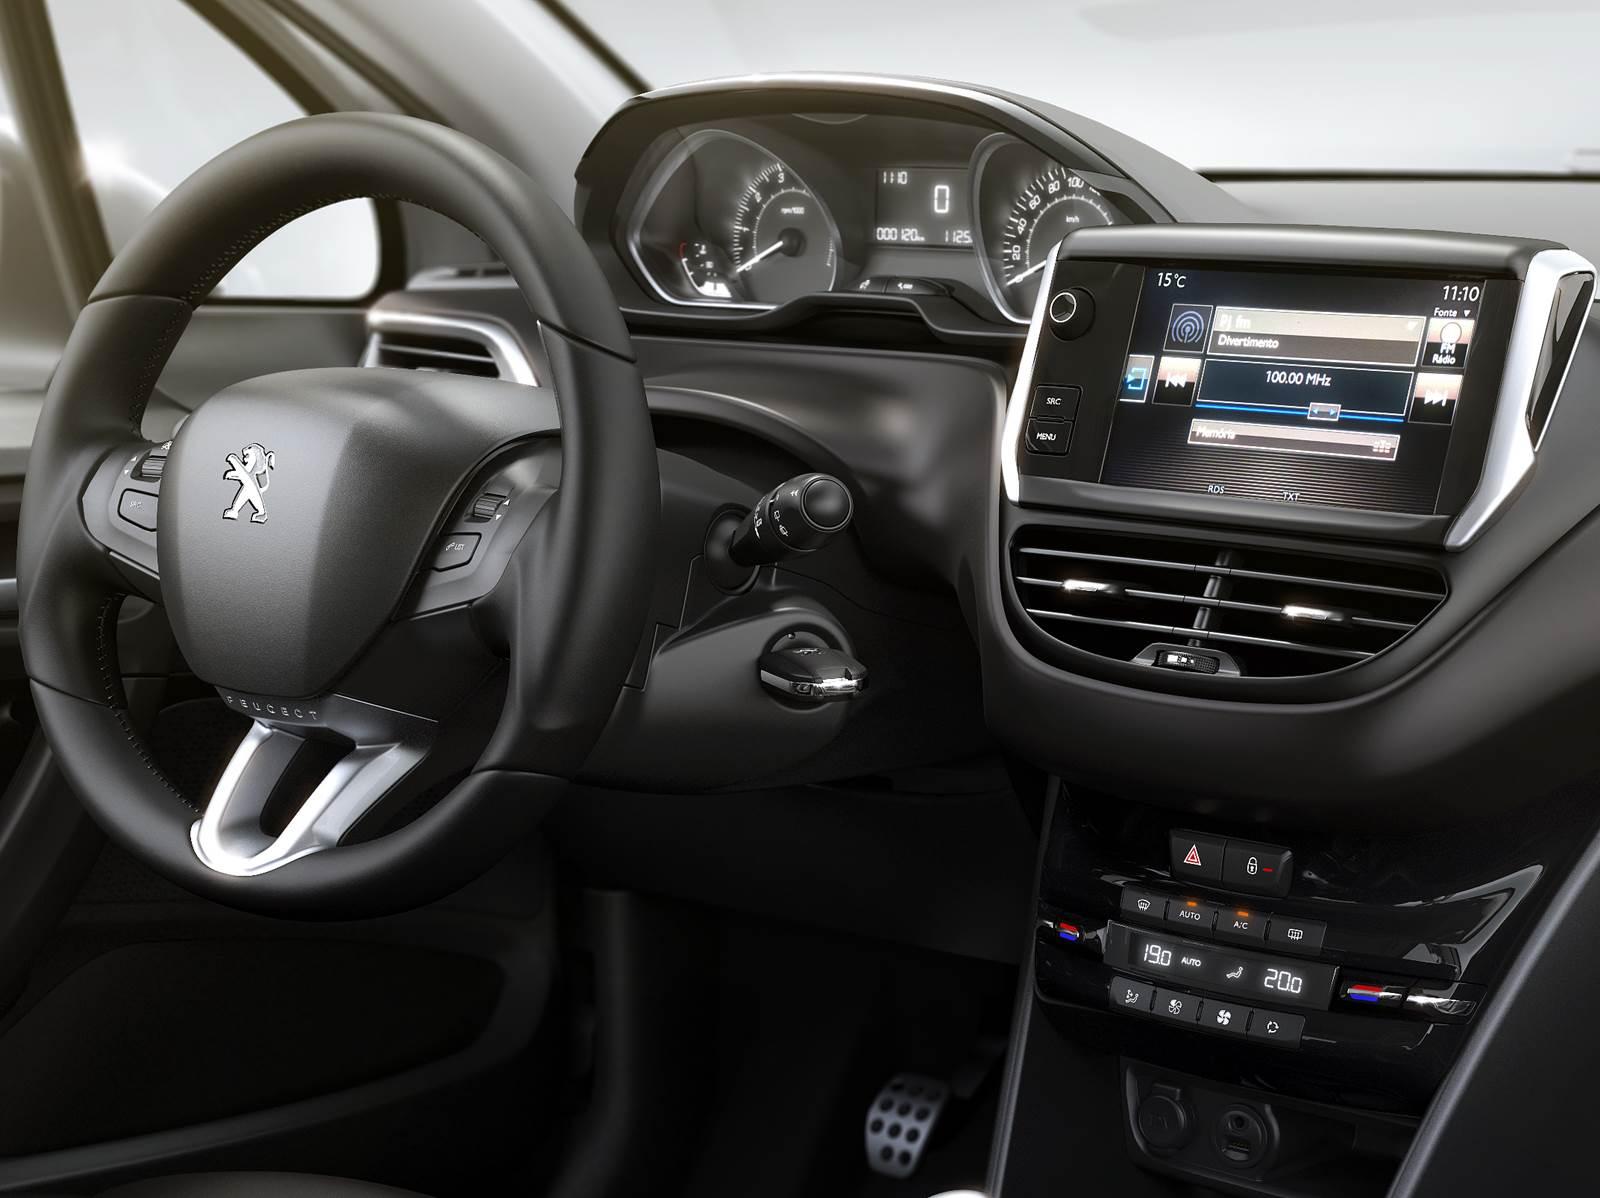 Novo peugeot 2008 dados de consumo vers es e motores for Peugeot 2008 interieur